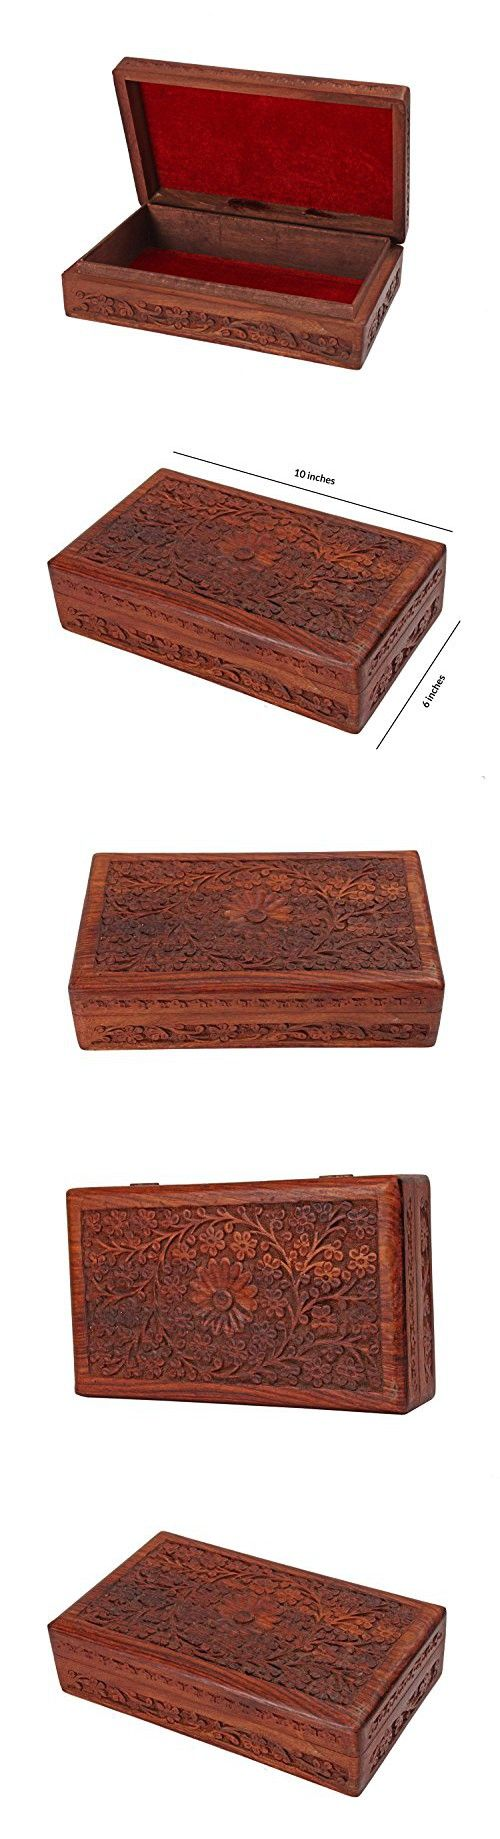 "Rakhi Gift for Sister Intricate Wooden Jewelry Box Organizer - 10 x 6"" Handcrafted - Multipurpose Keepsake Storage Chest"